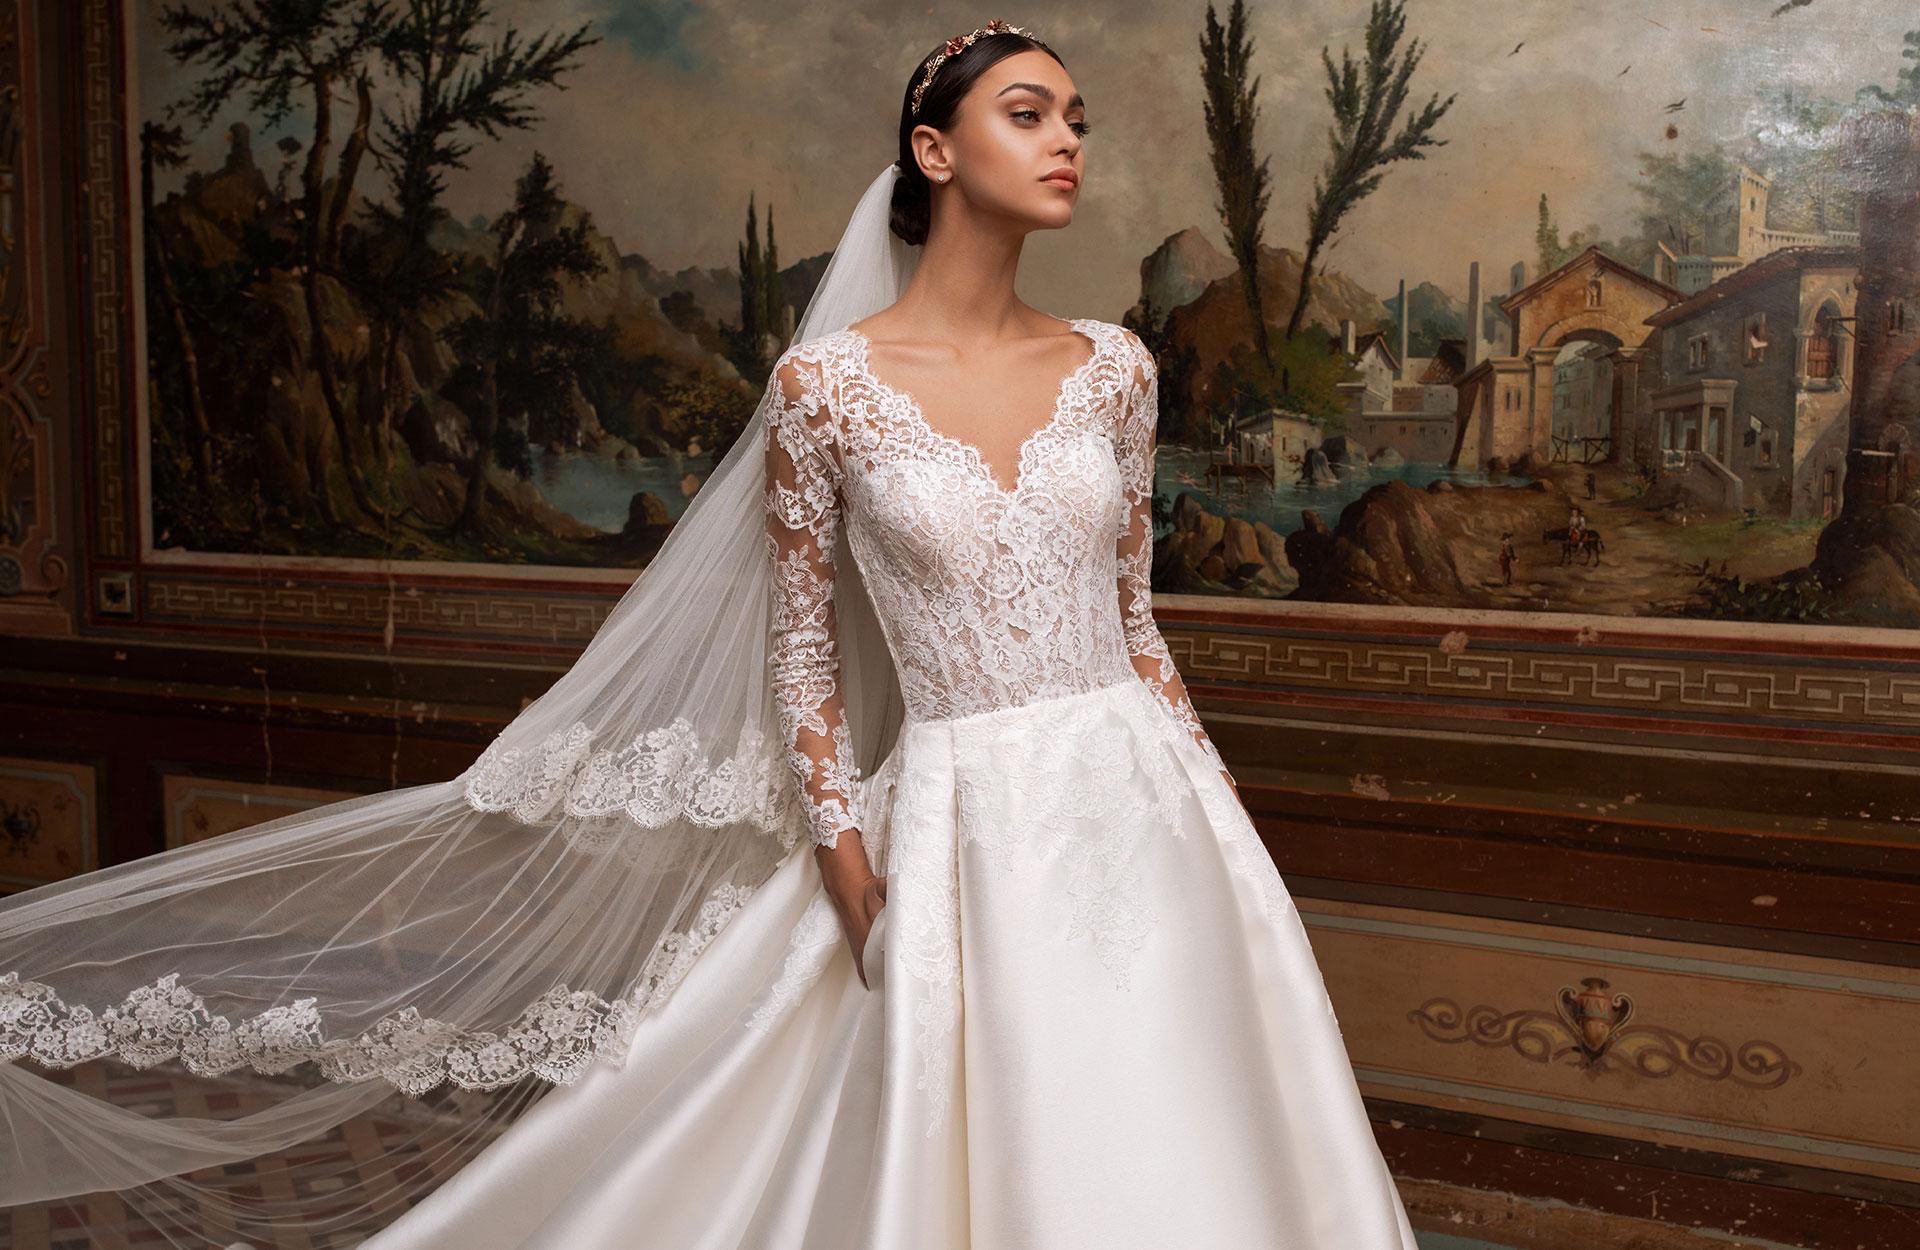 Brudekjoler fra Skott i Rold Bryllup